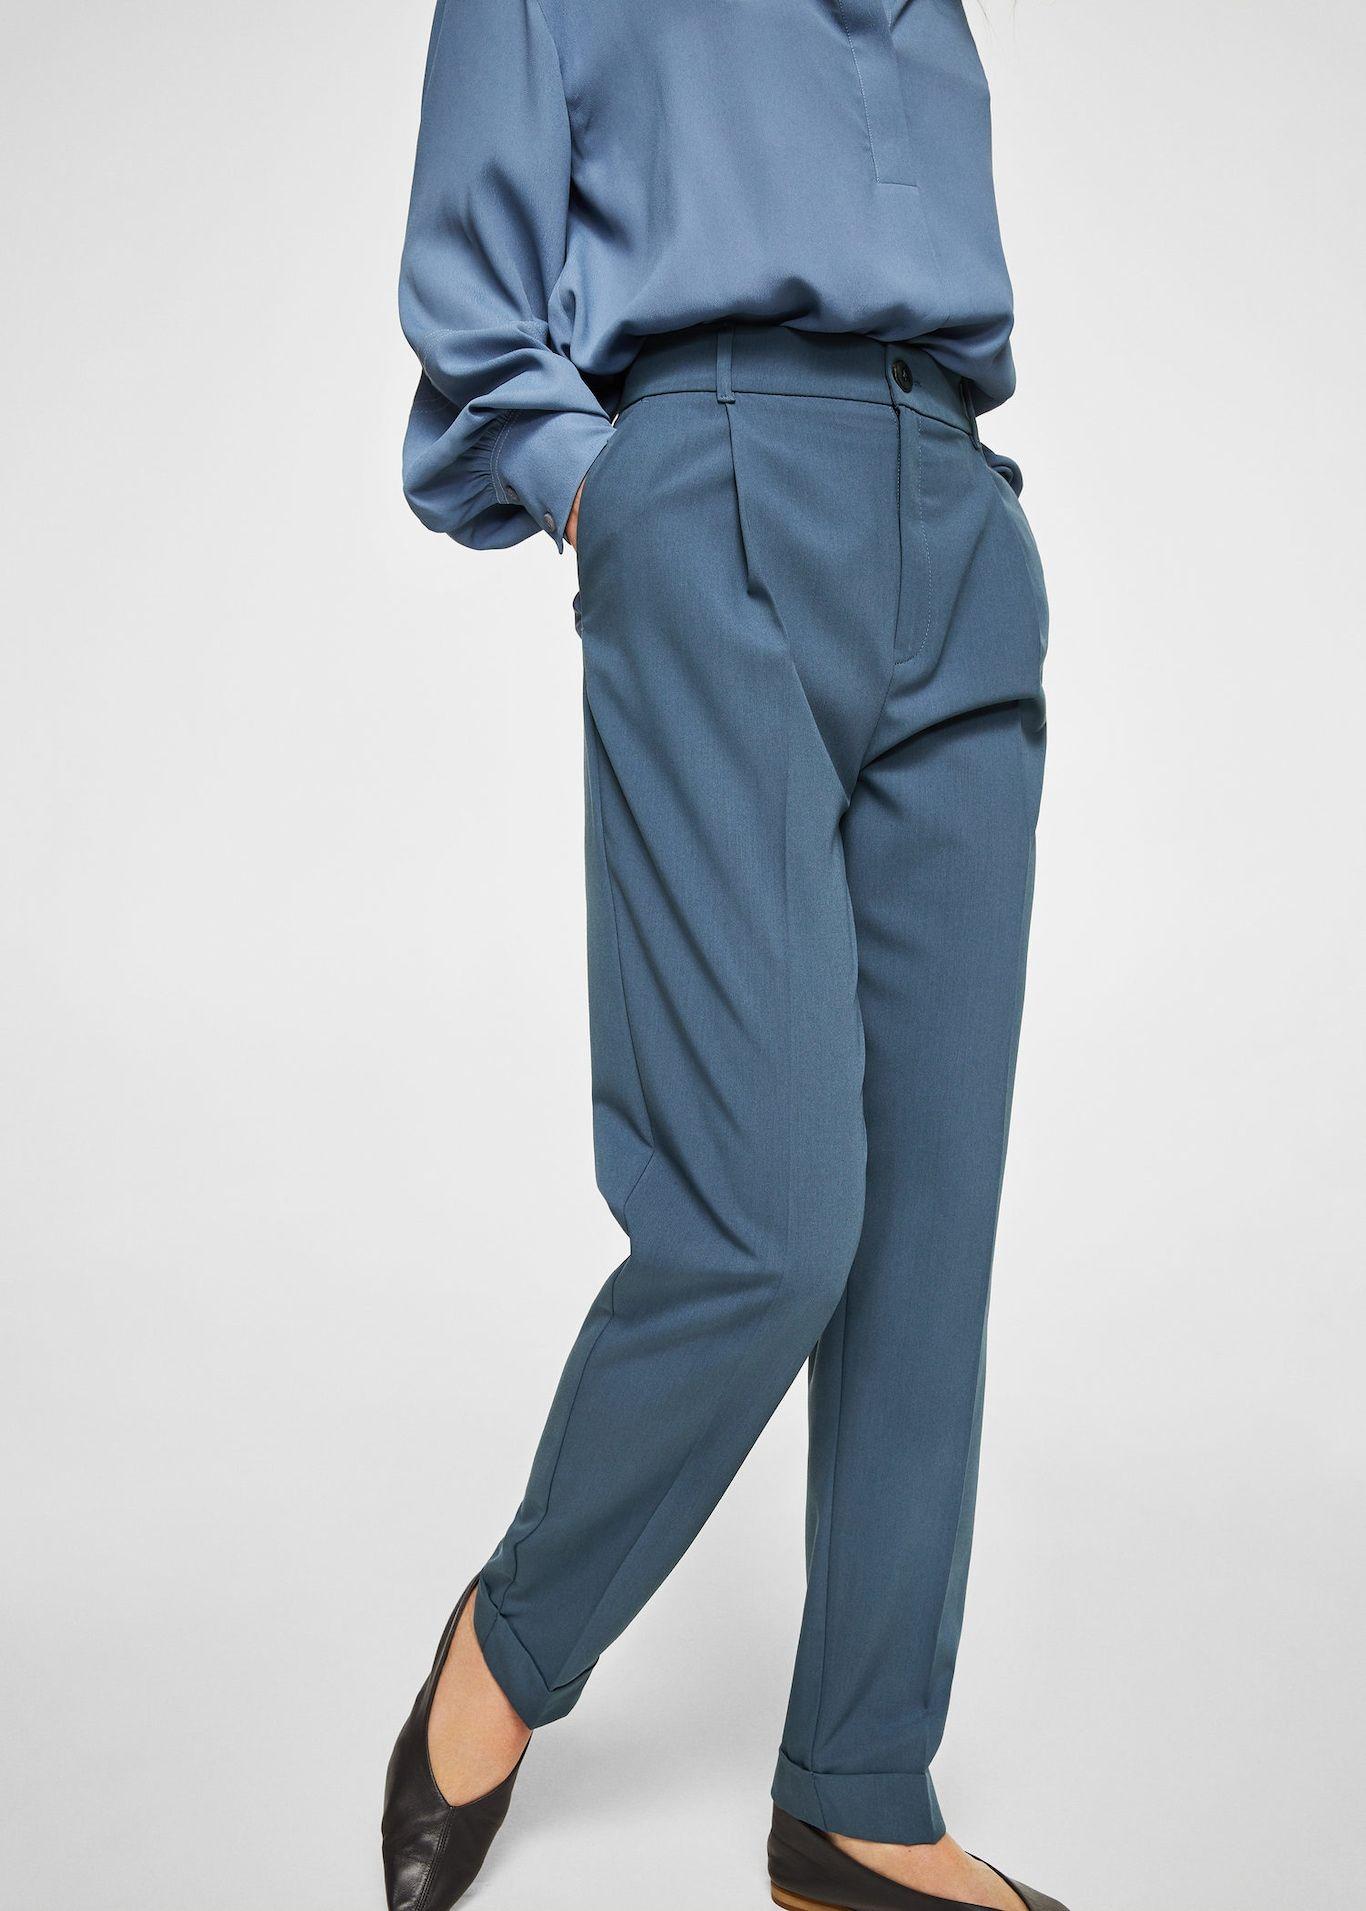 Garniturowe Spodnie Z Zakladkami Kobieta Mango Polska Trousers Women Trouser Suits Trousers